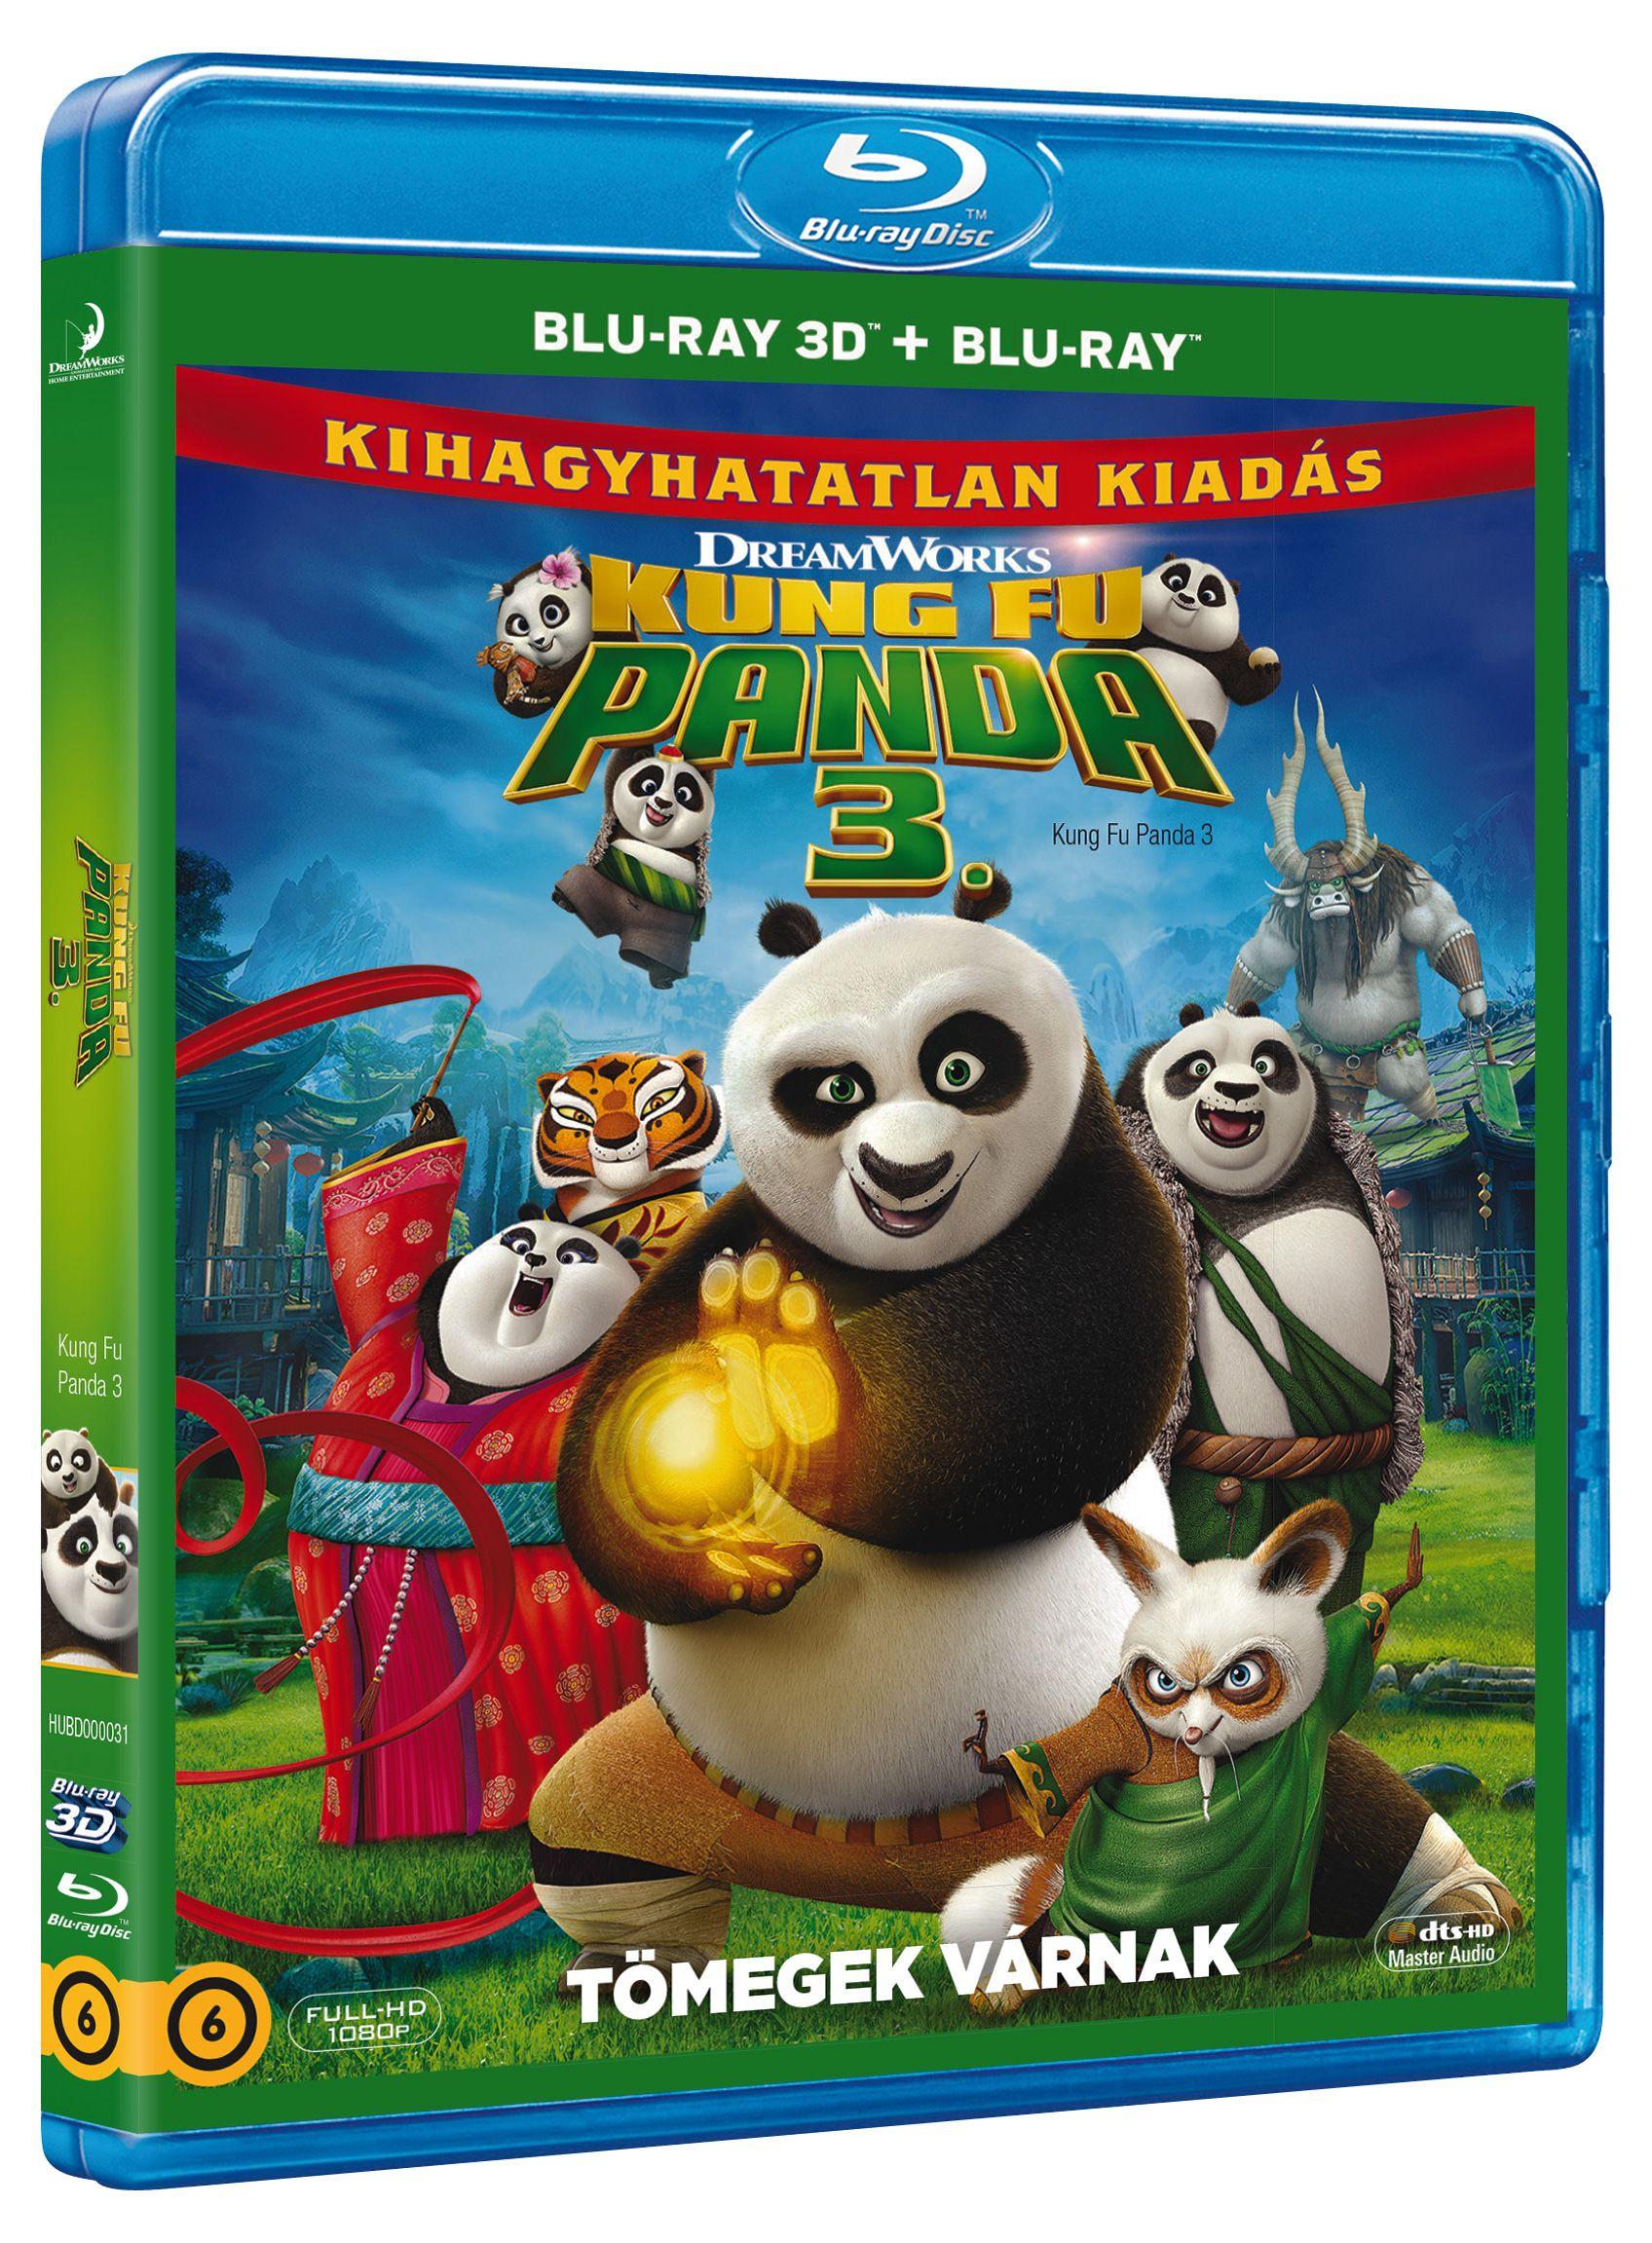 Kung Fu Panda 3. 2D és 3D Blu-ray